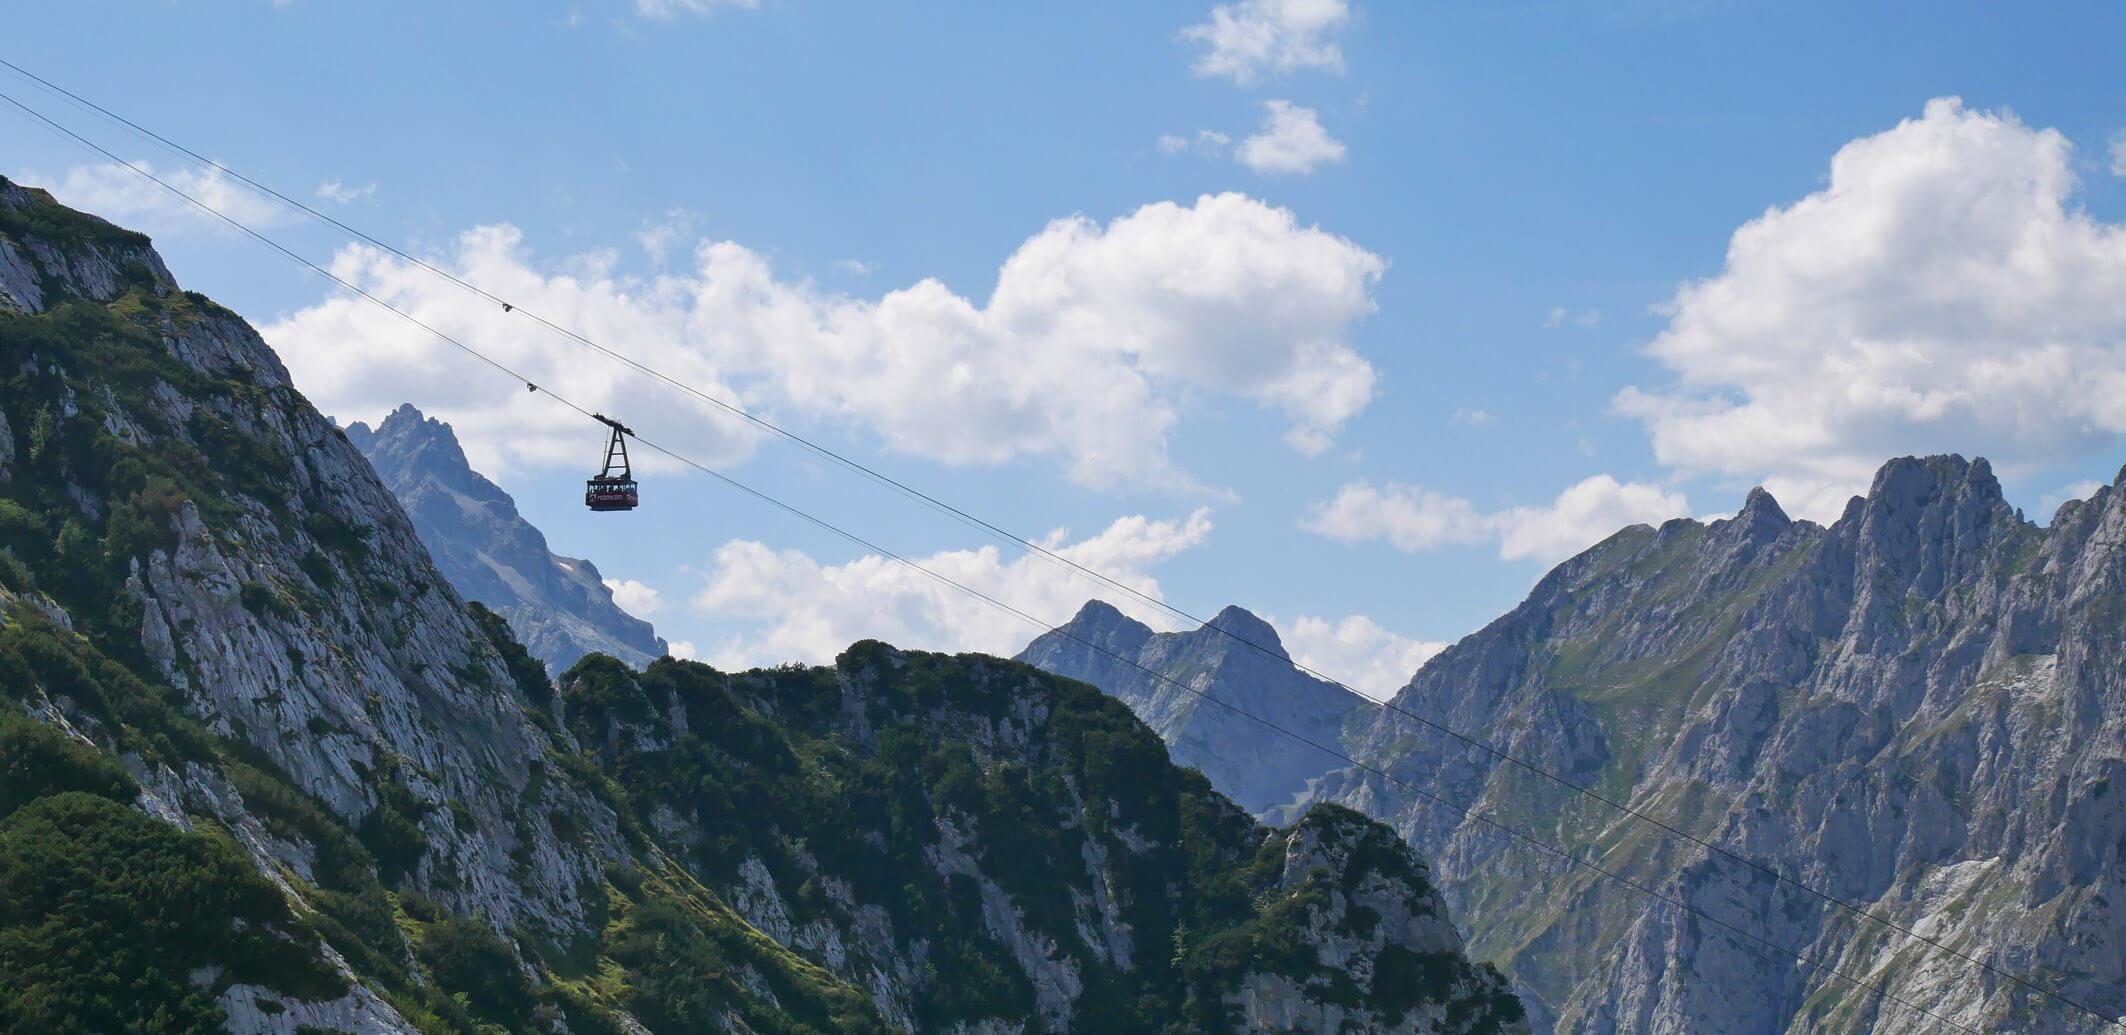 Wettersteingebirge Osterfelderbahn